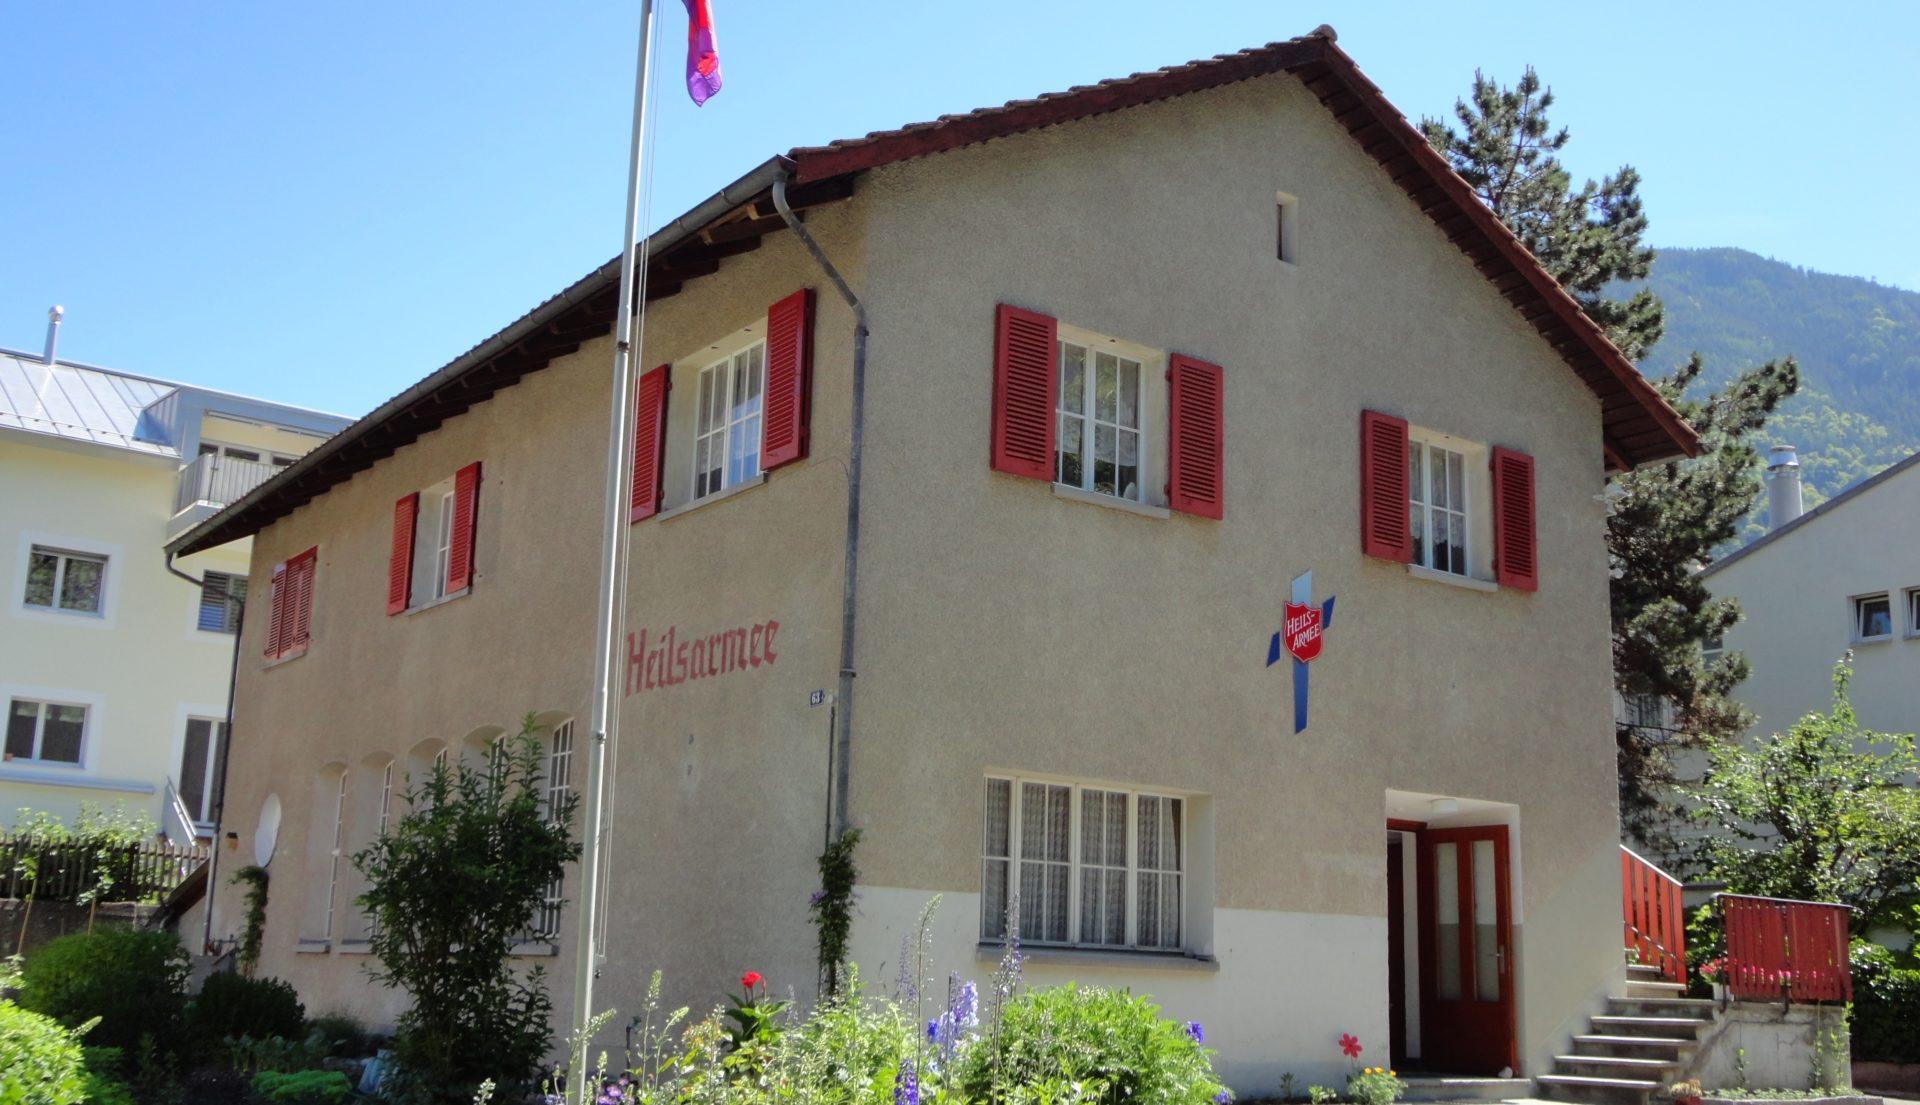 Heilsarmee-Haus Chur